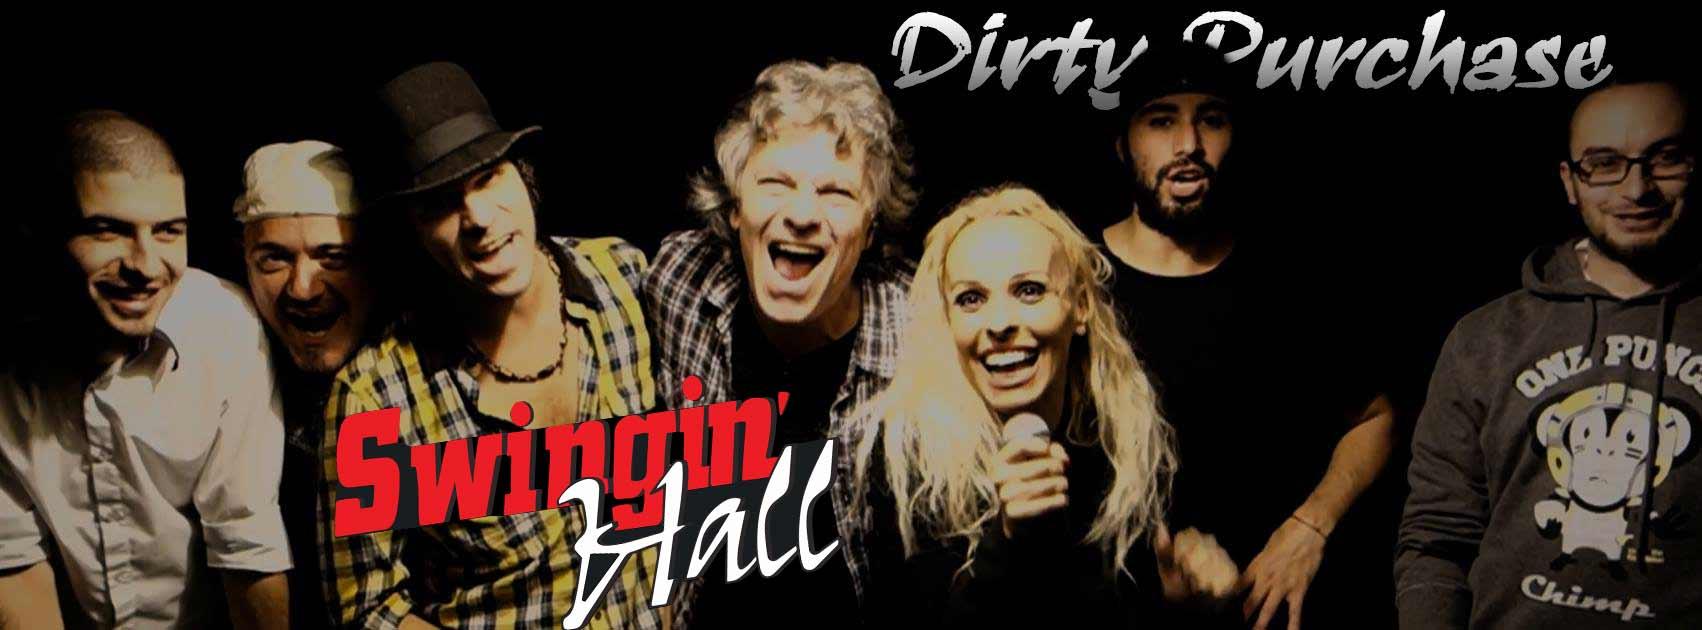 Dirty Purchase с Marcello Billy Tempesta и Dih. Ramos | 16 ноември 2018г. 23:00ч. Swinging Hall